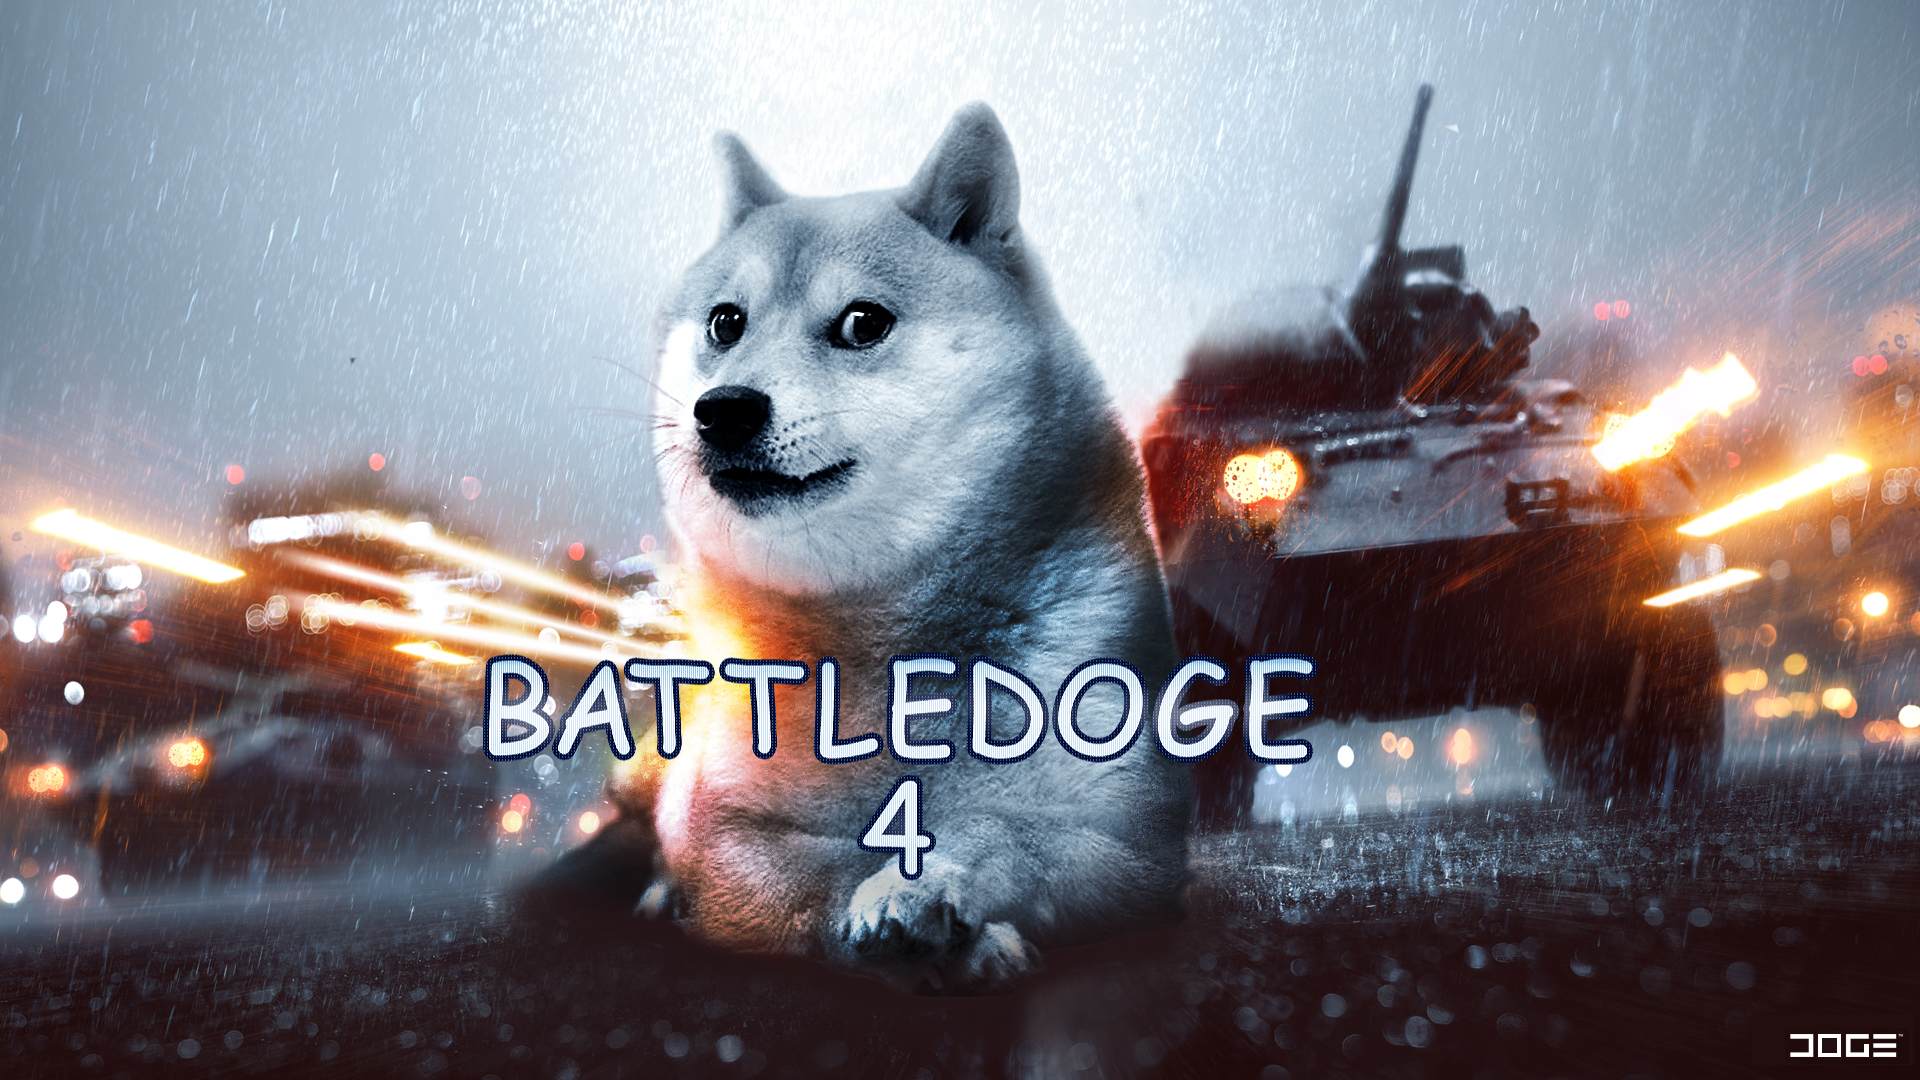 BATTLEDOGE 4 by DOGE Doge Know Your Meme 1920x1080